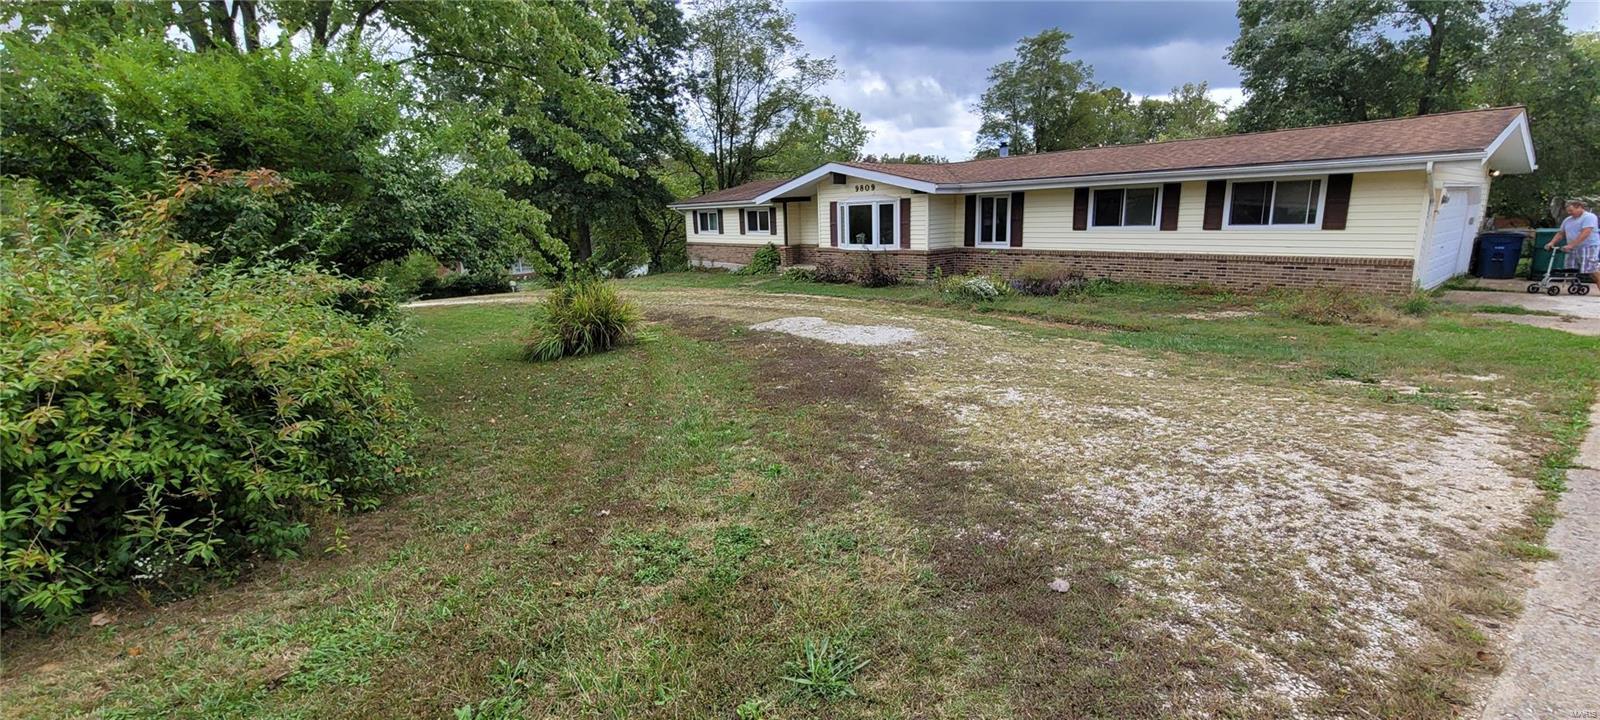 9809 Sandy Church Property Photo